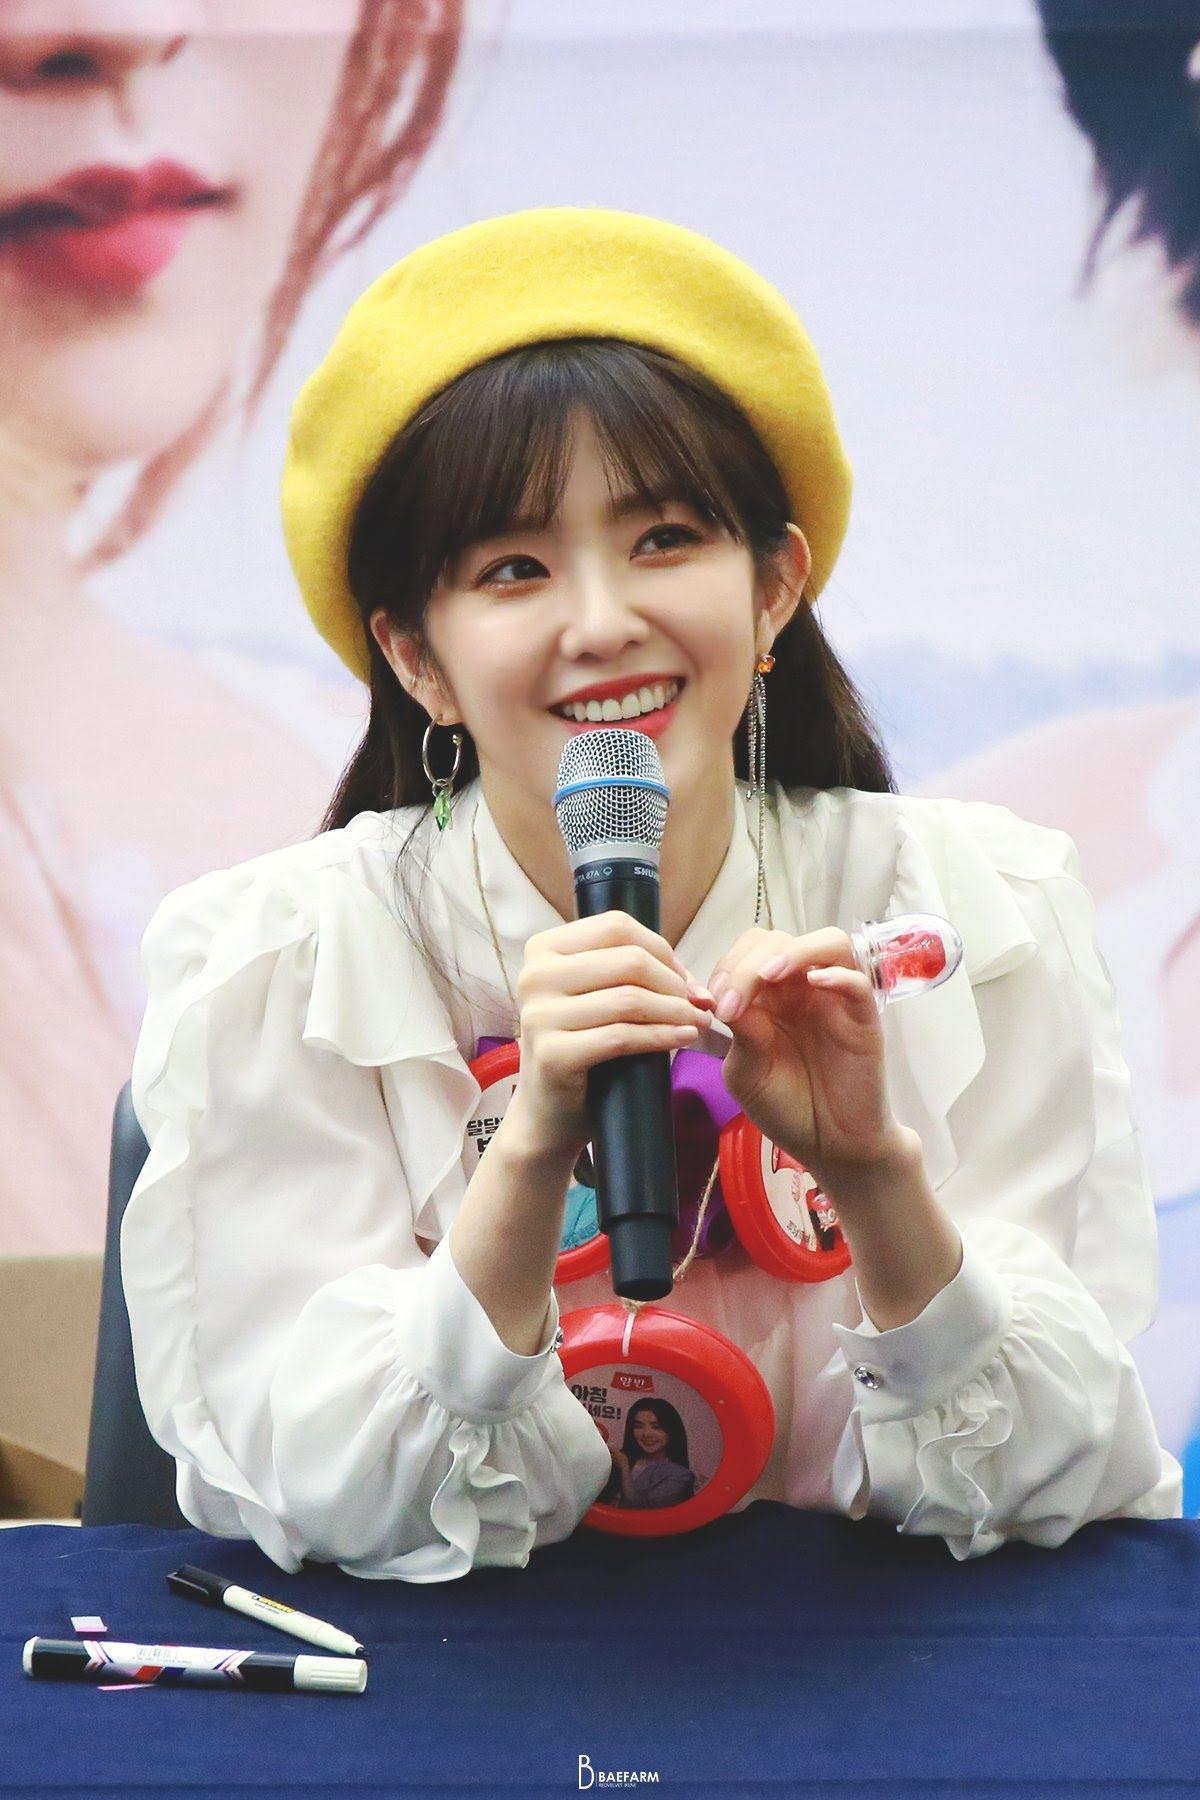 Red Velvet Irene Has 'Hotel Del Luna' Vibes In Recent Fan Sign Event